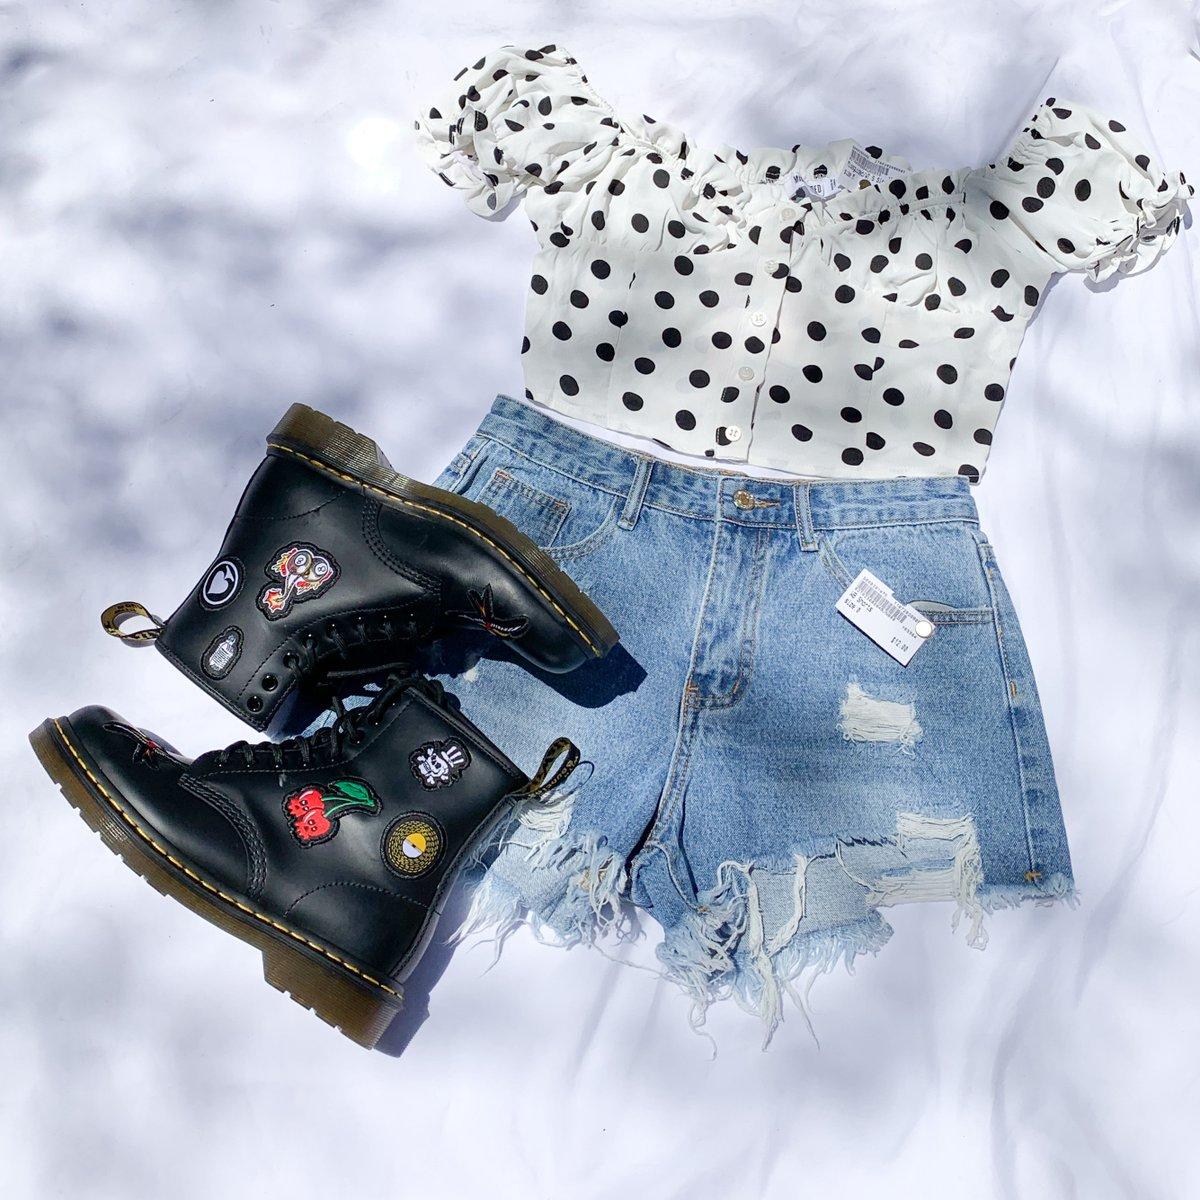 Polka Dot Cutie! 😍  Missguided Short Sleeve M $13  Women's Shorts Size 0 $12  Women's Dr. Martens Boots Size 7 $75   #platosclosettemecula #platoscloset #drmartens #missguided #ootd #thriftfinds #gentlyloved #murrieta #temecula #riverside